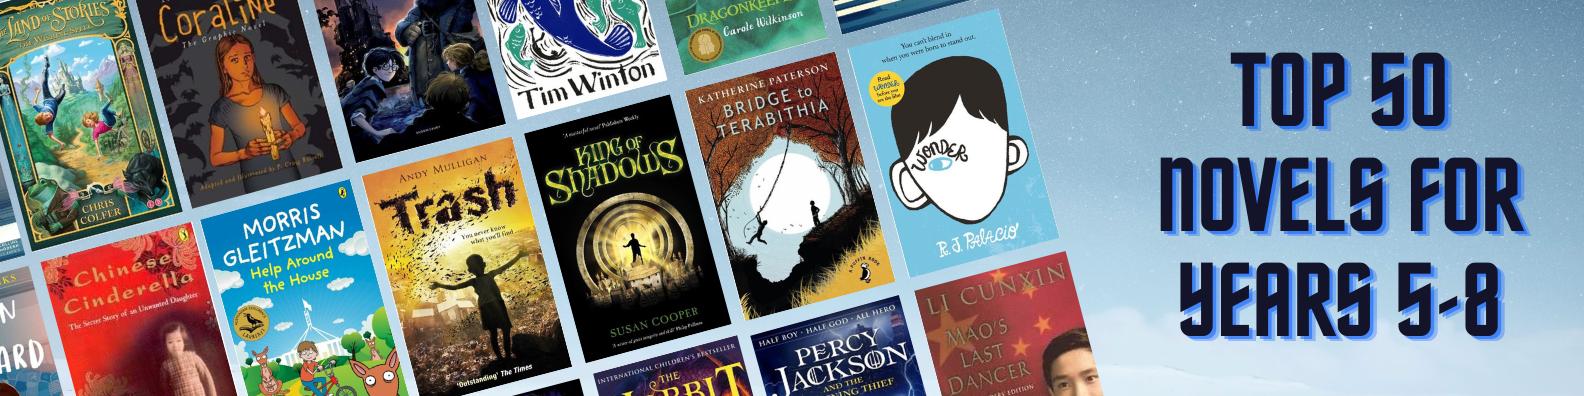 Top 50 Middle Fiction Novels